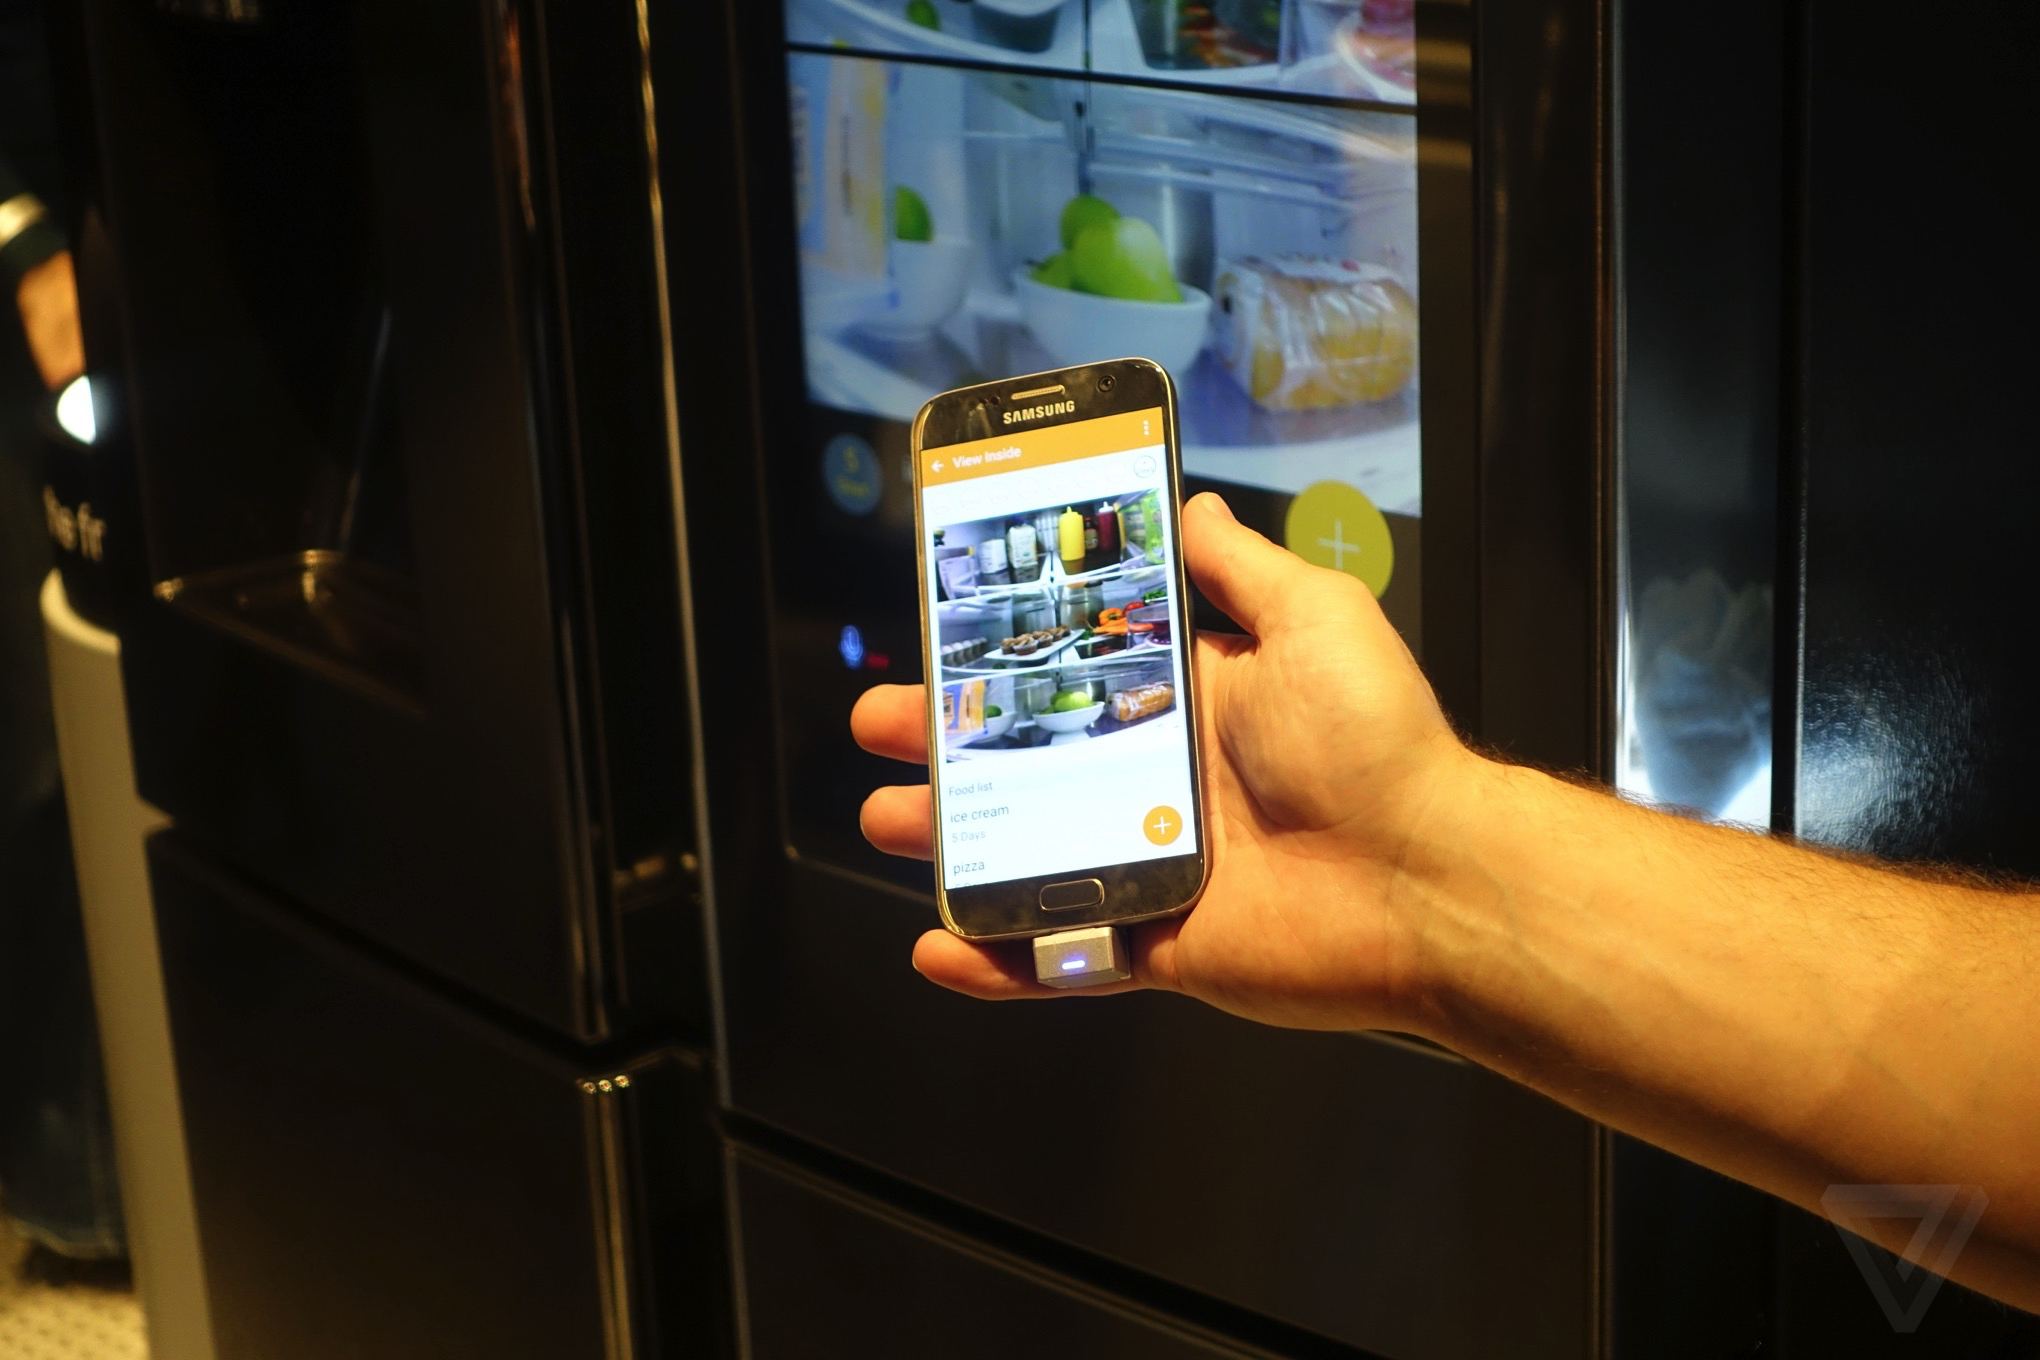 Samsung's Family Hub smart fridge is ridiculous, wonderful